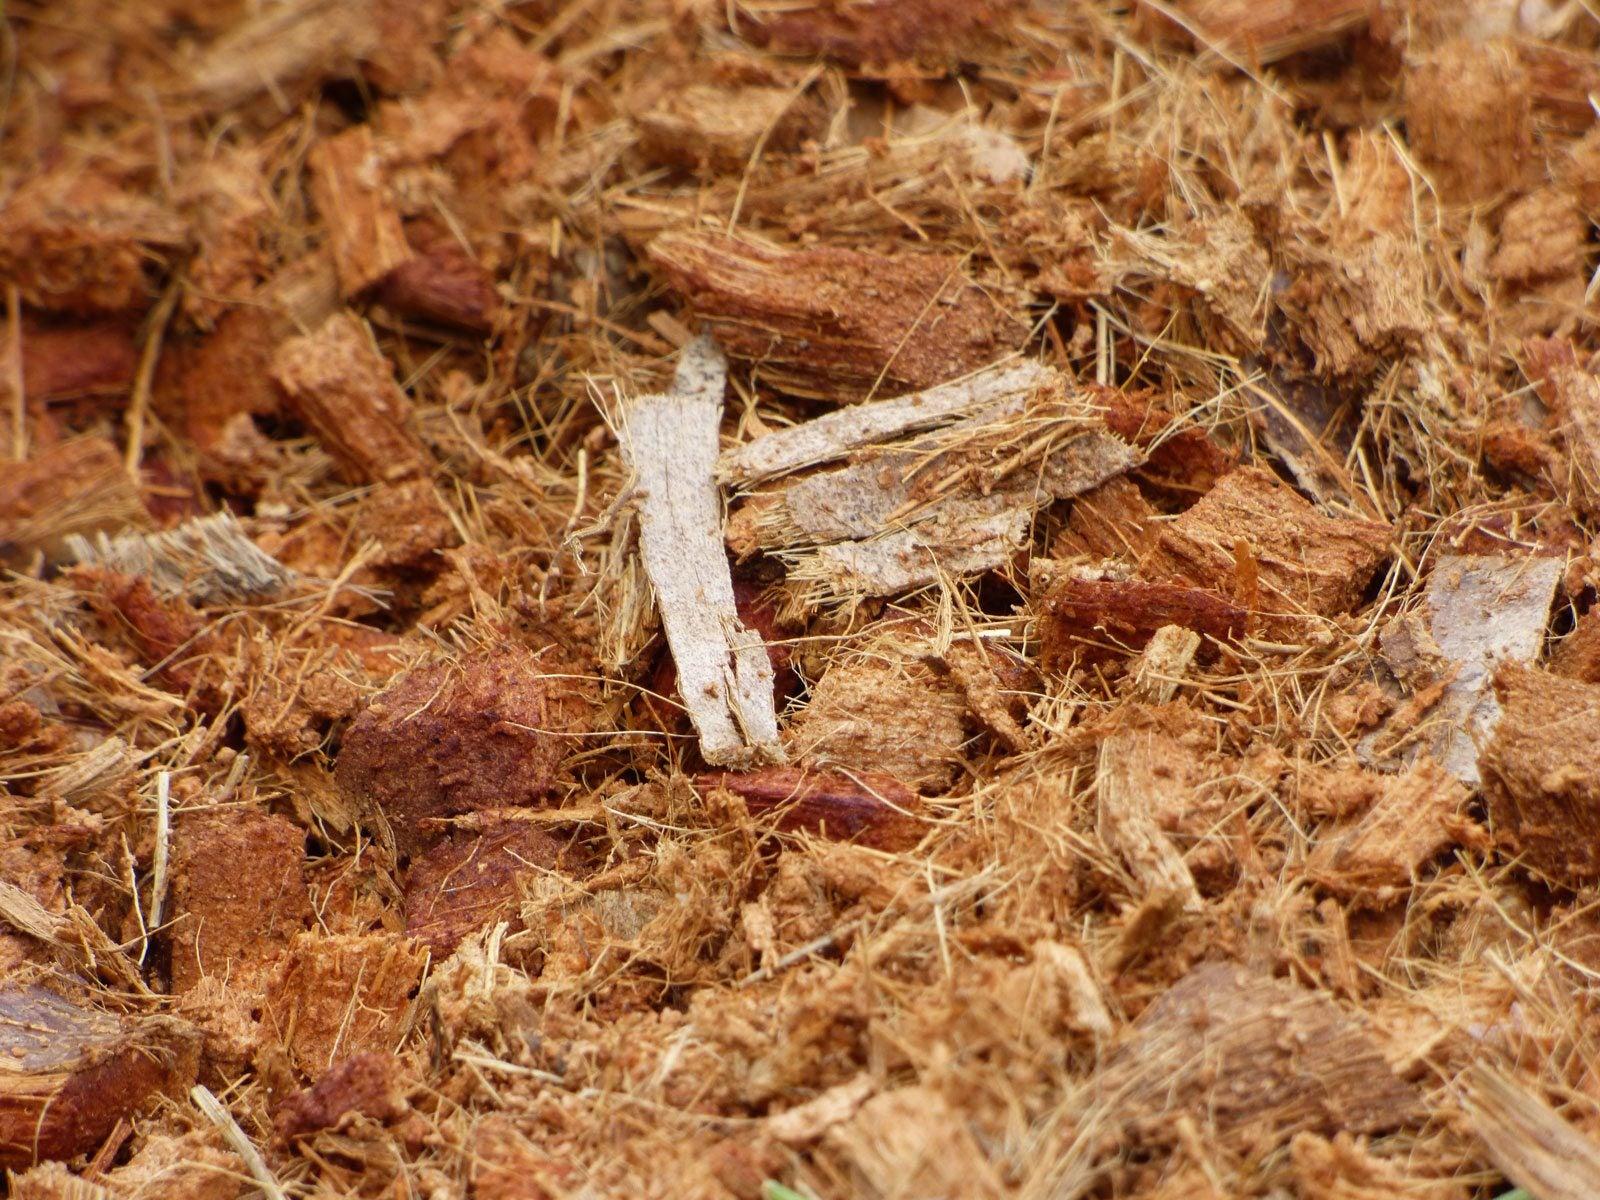 Coconut Coir Mulch Benefits Suggestions For Coir Mulch